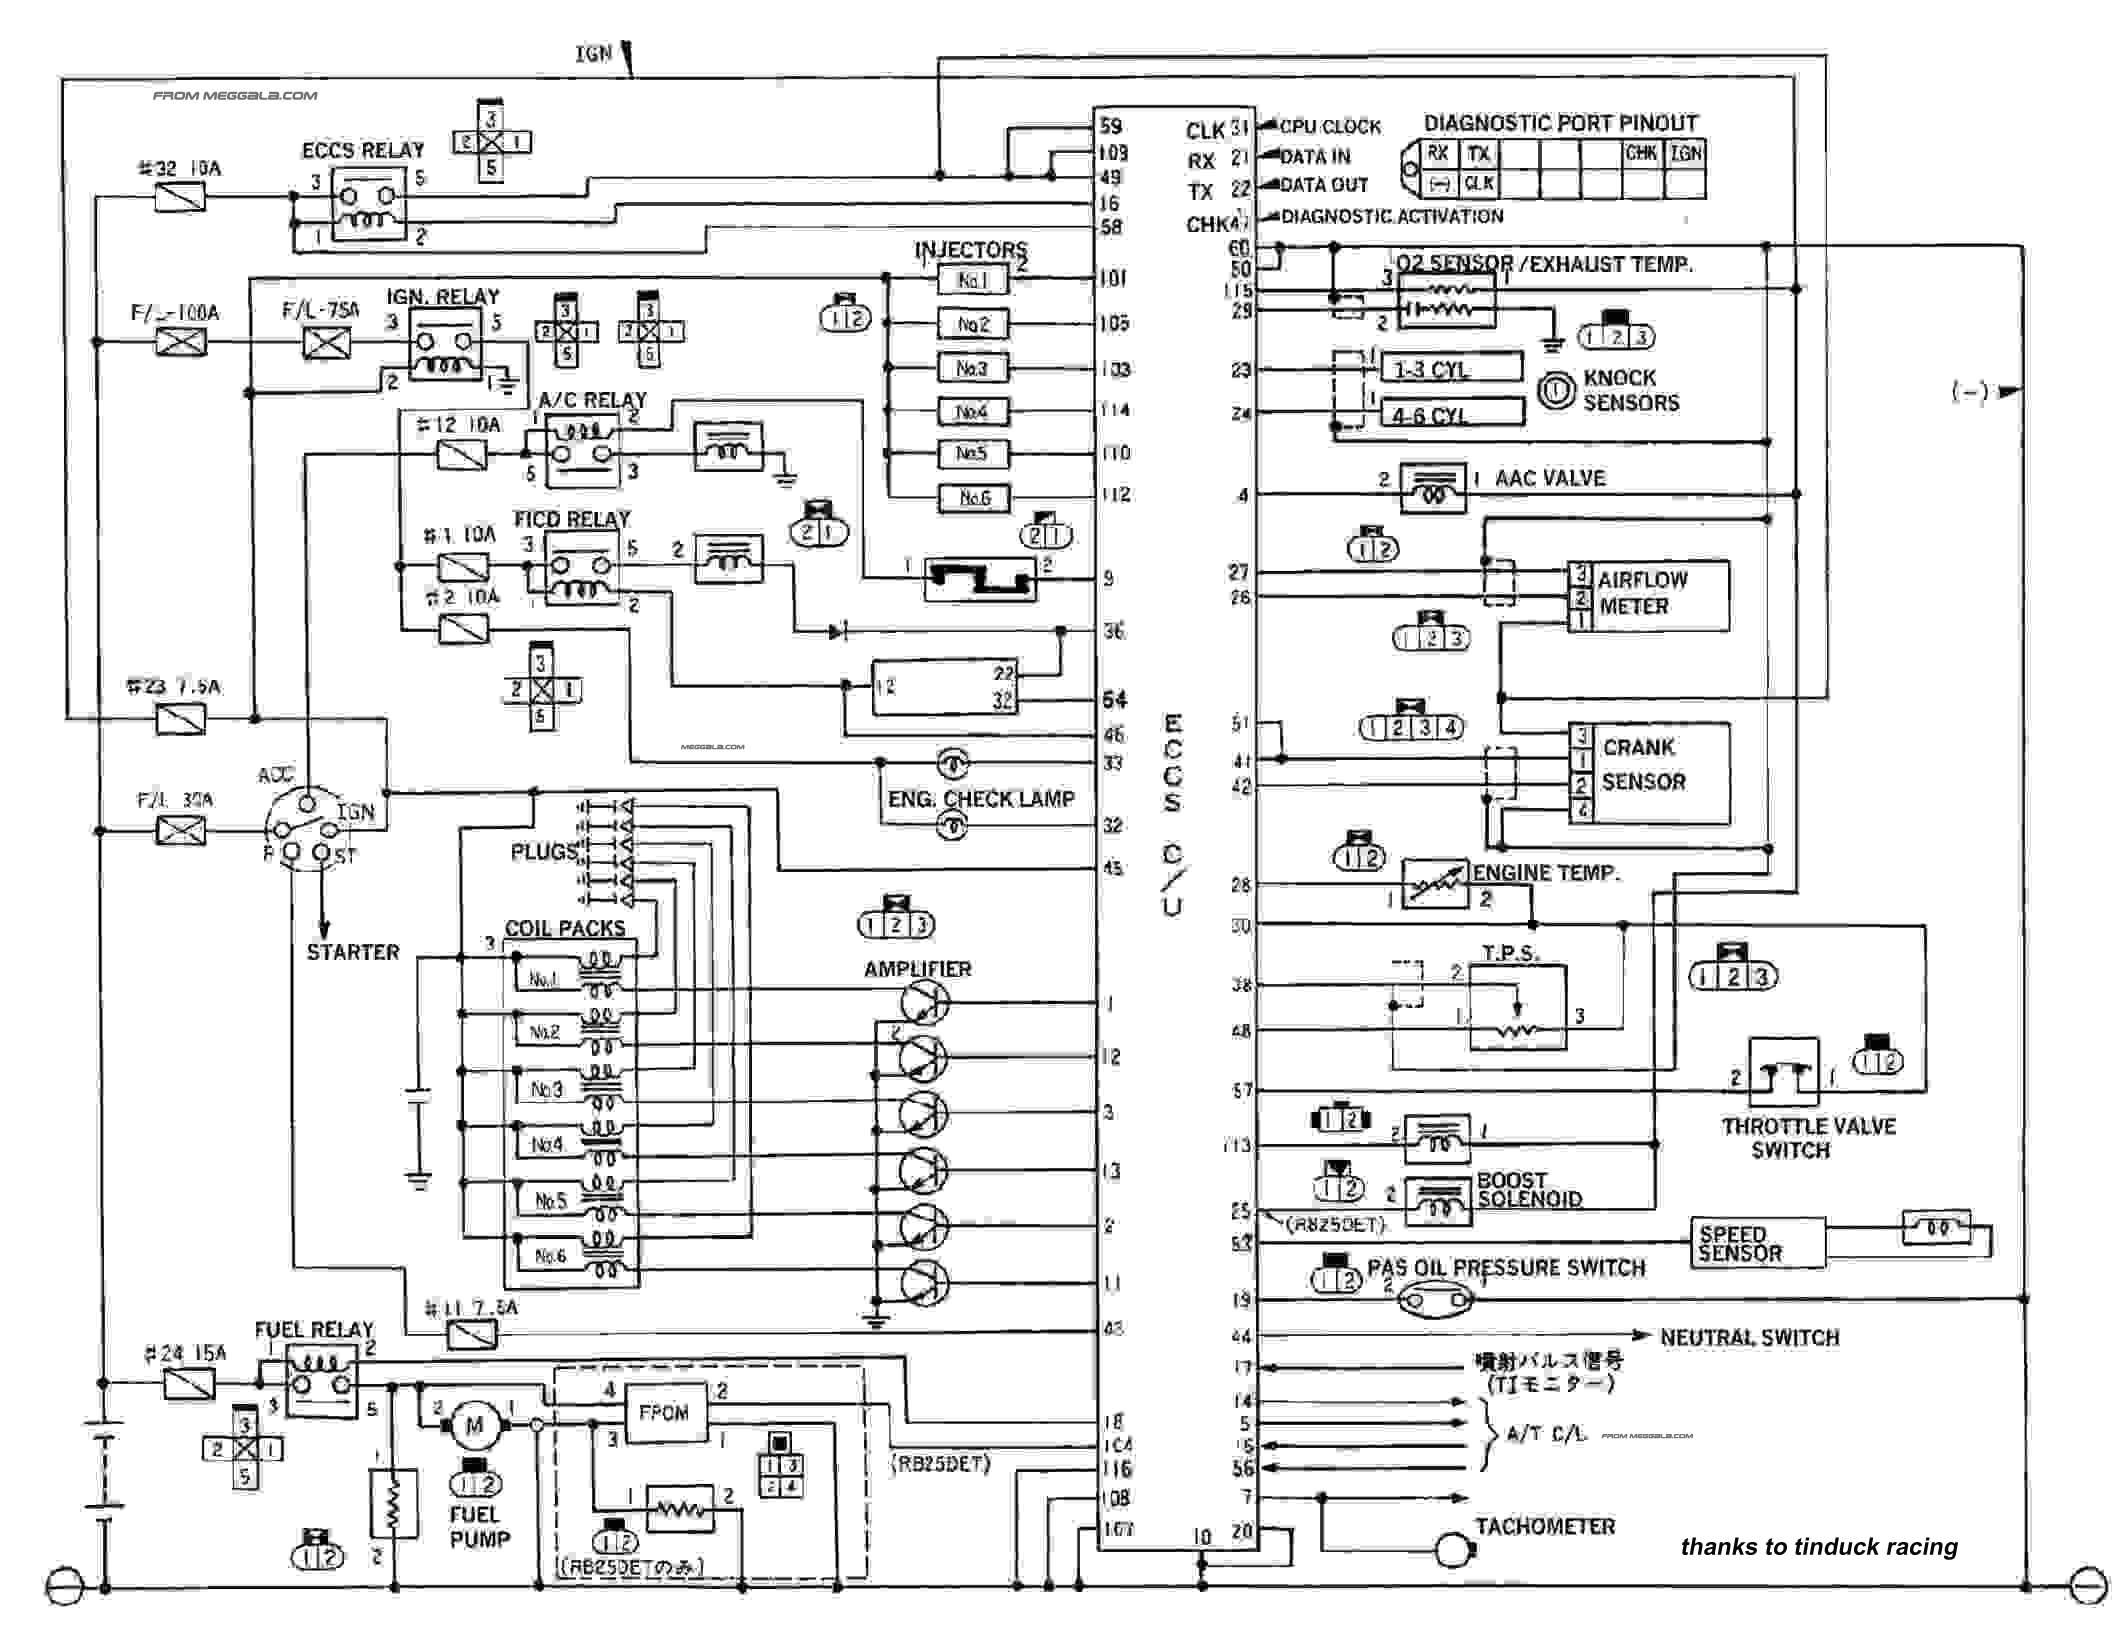 1990 nissan 240sx fuse diagram detailed schematics diagram rh lelandlutheran com 1994 nissan 240sx wiring